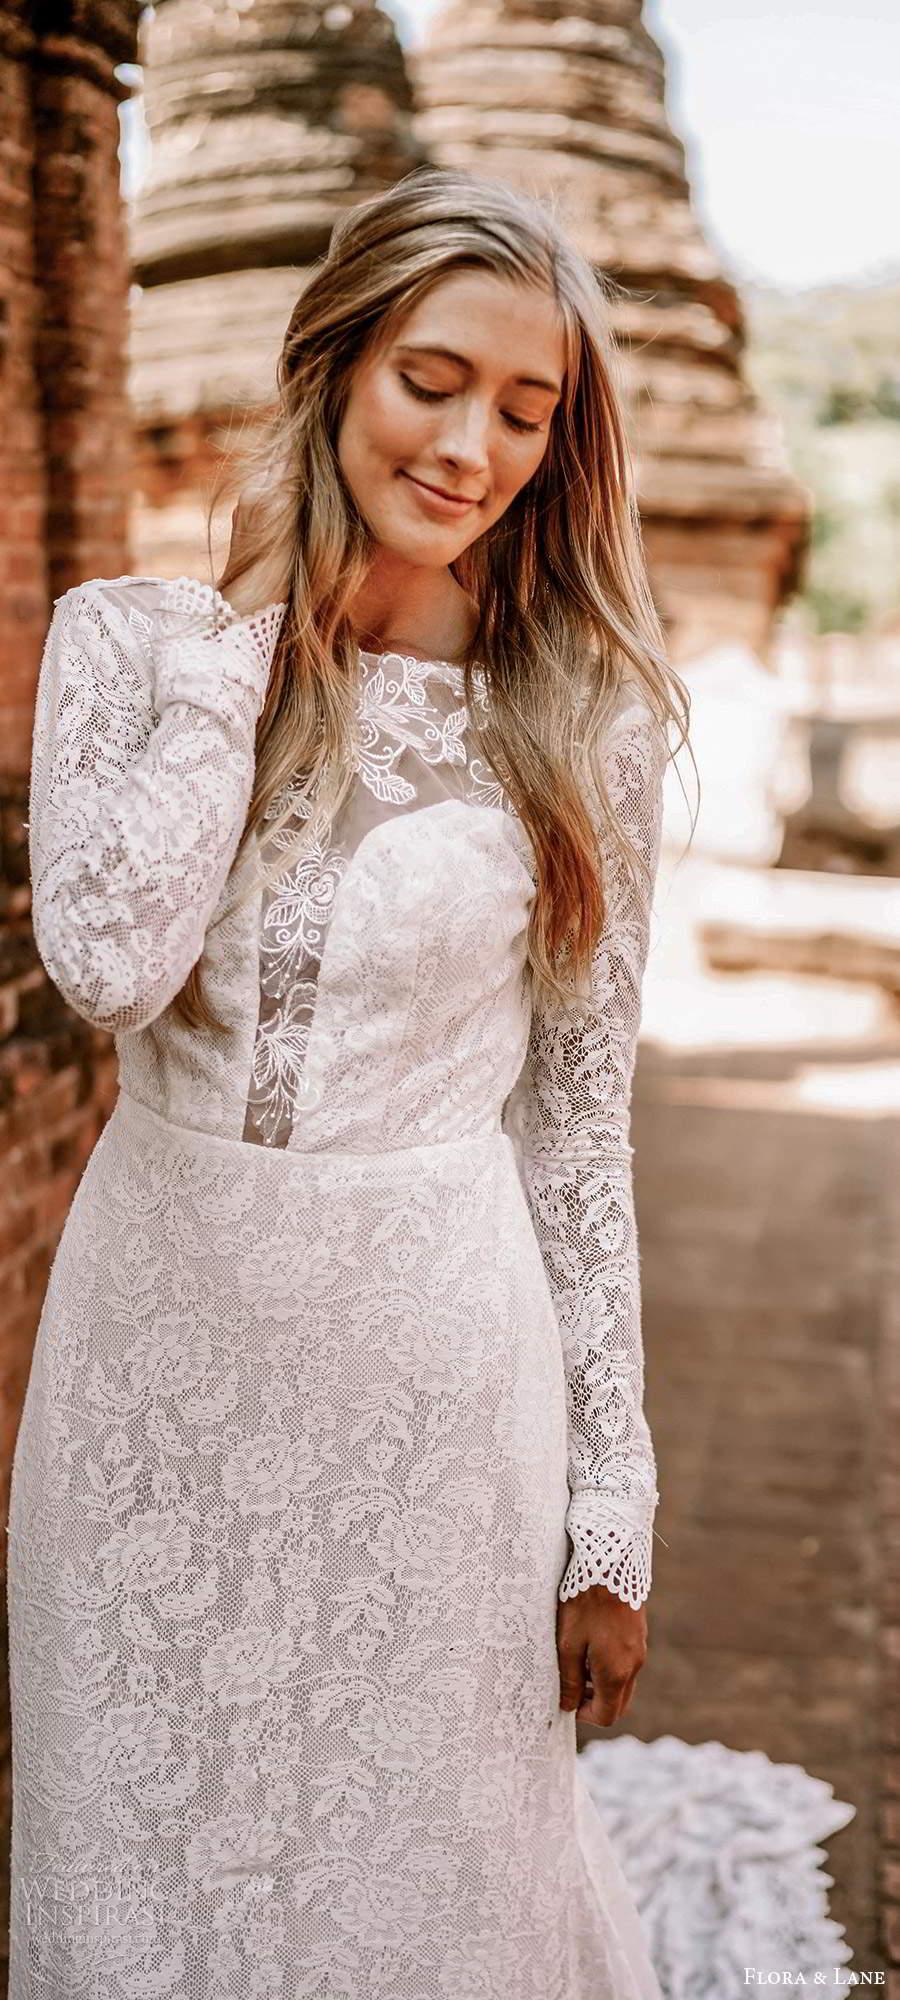 flora and lane 2019 bridal long sleeves bateau neckline fully embellished lace boho romantic mermaid sheath wedding dress v back chapel train (5) mv